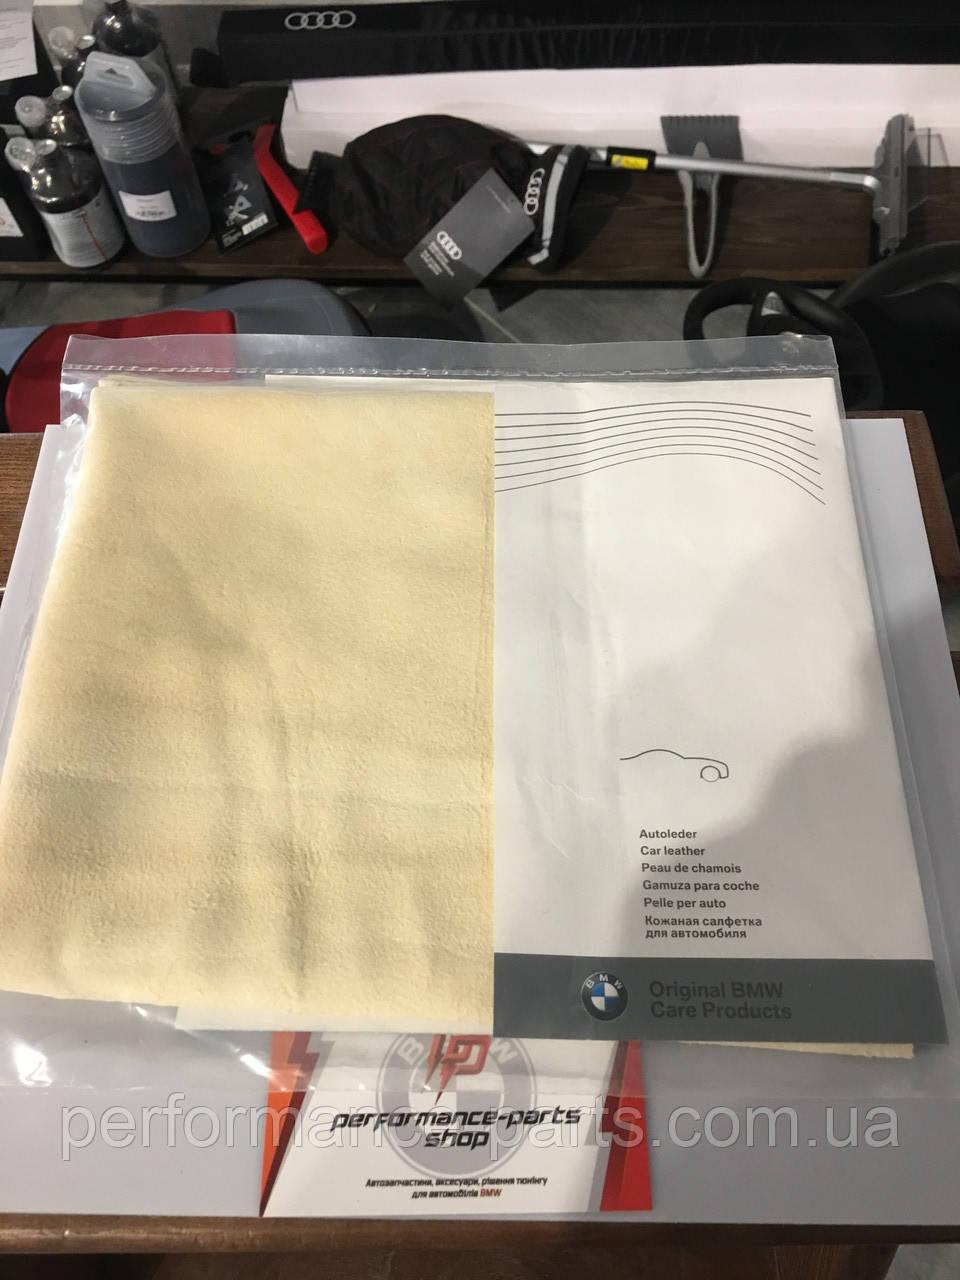 Автомобильная замша для ухода за BMW Genuine Car Cleaning Polishing Clean Leather Cloth, 83192298240. Оригинал